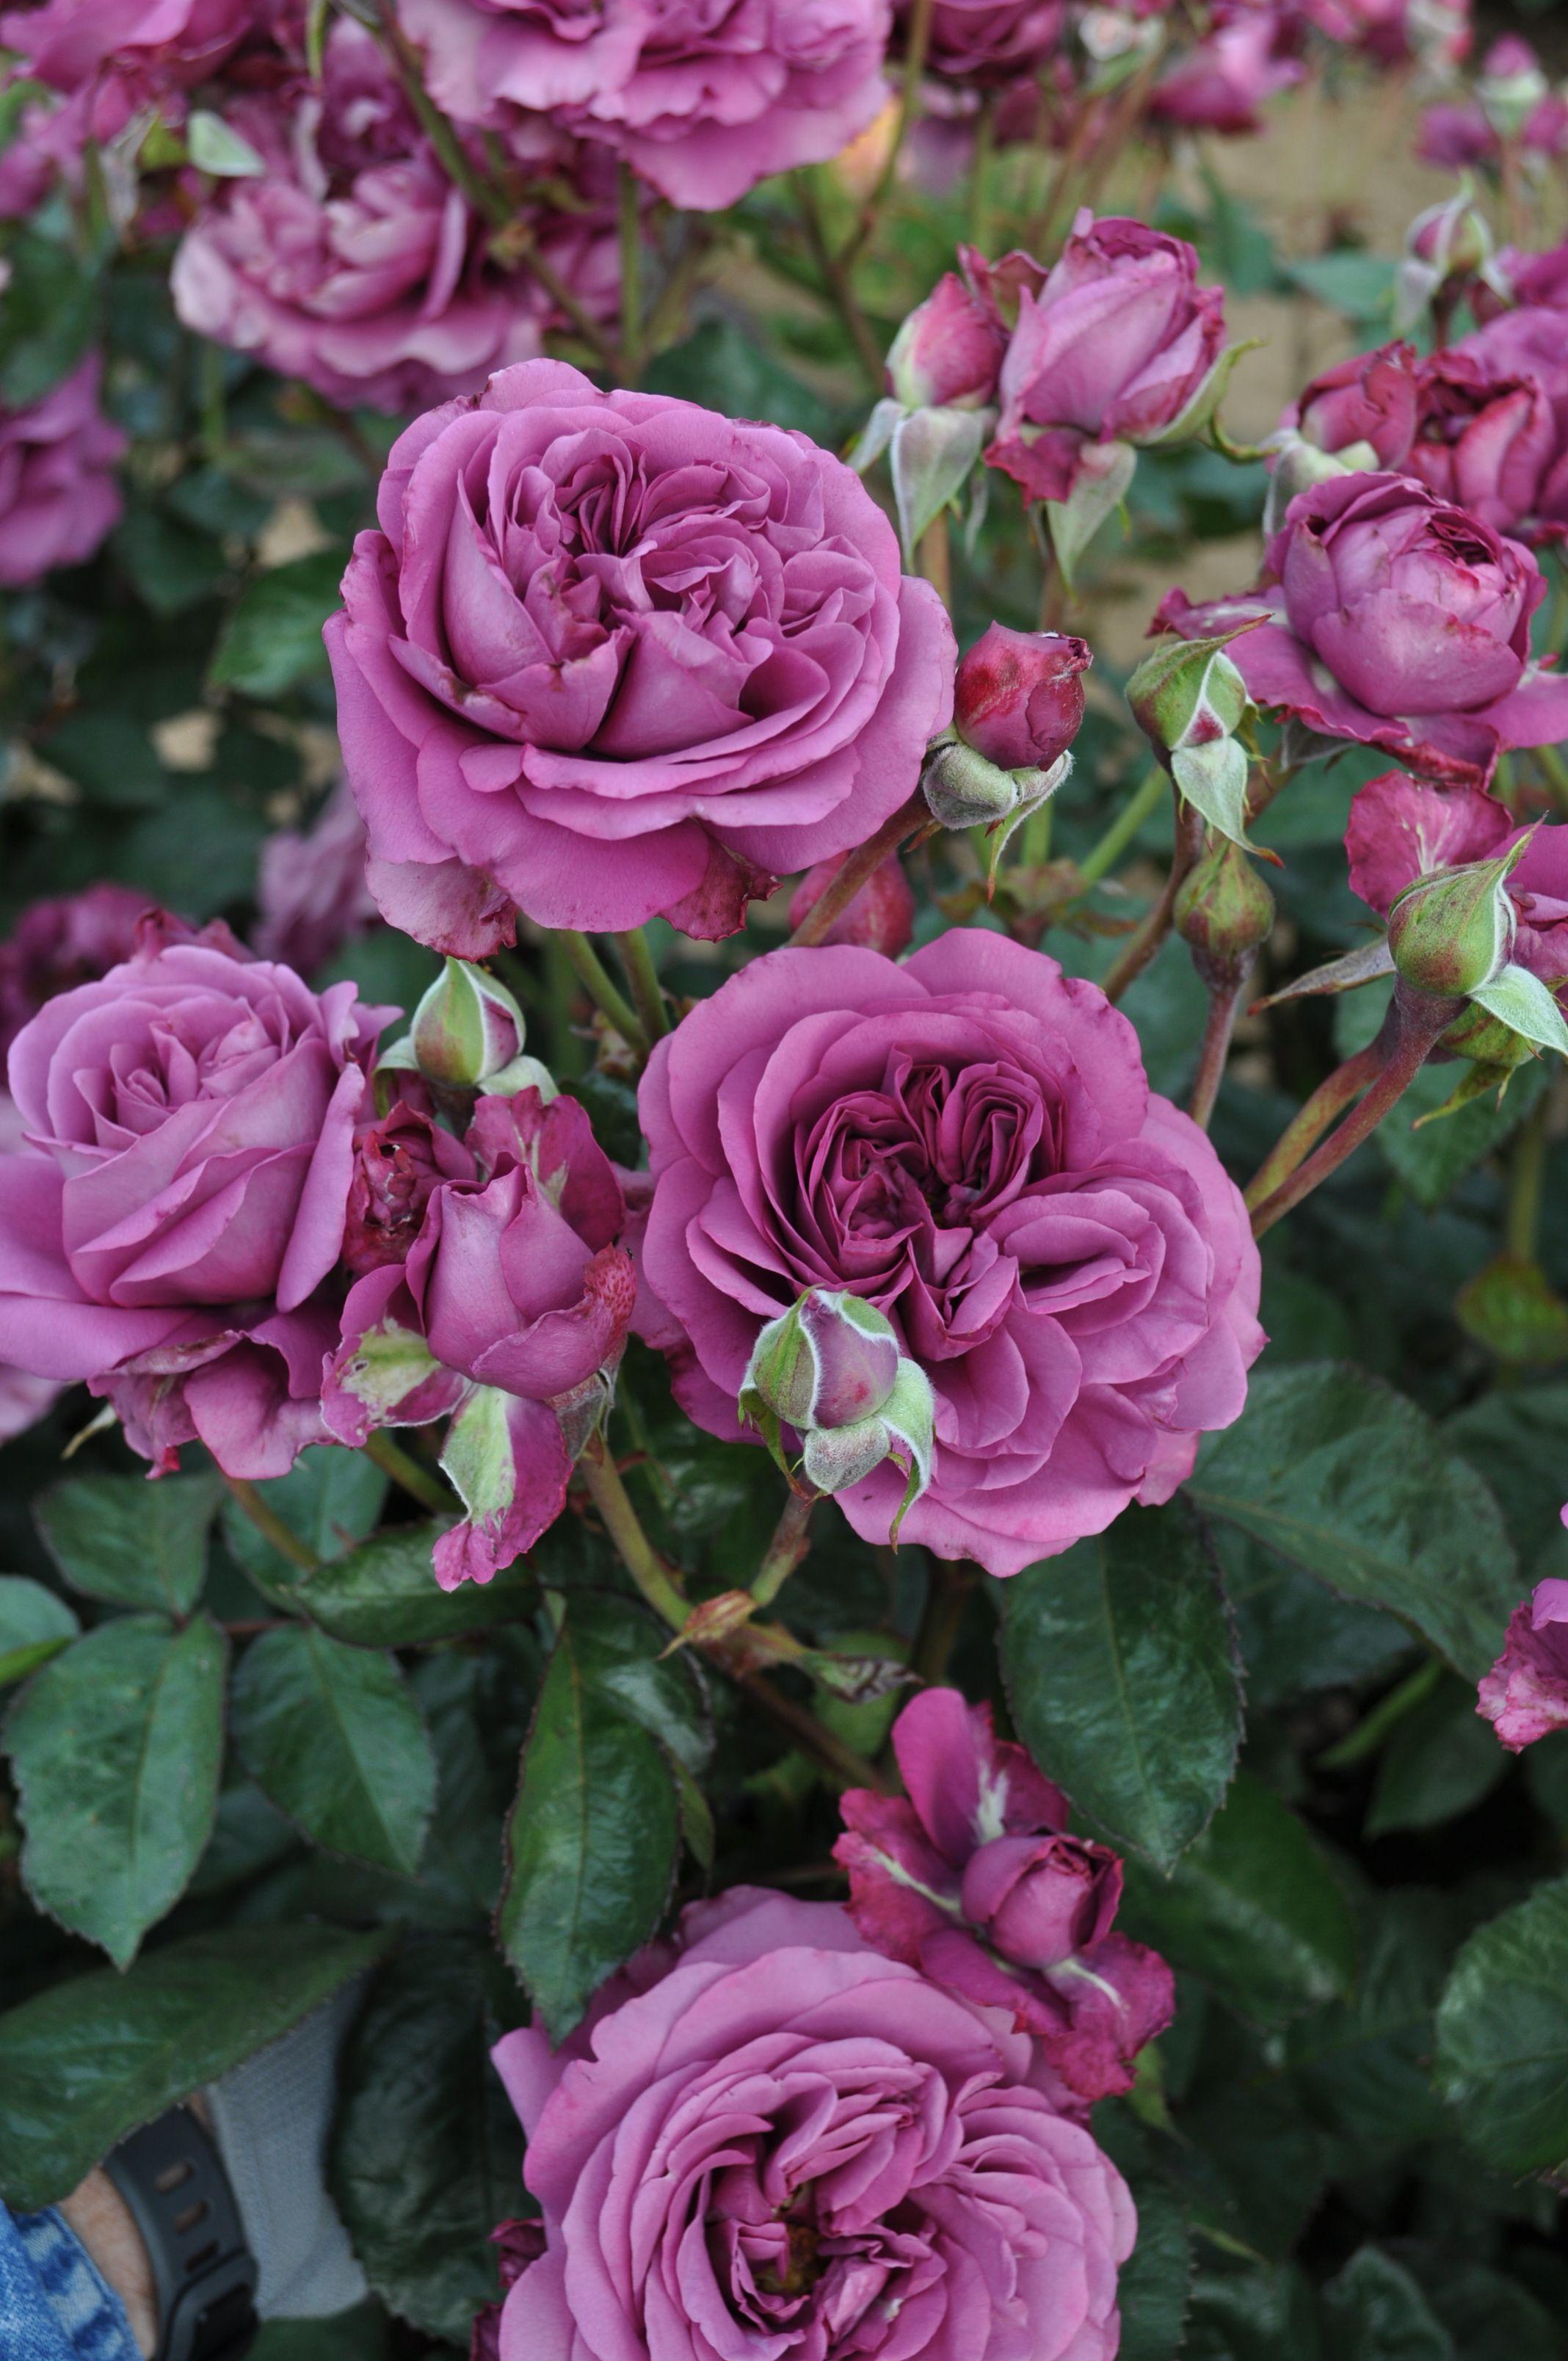 Plum Perfect All About Roses Floribunda Roses Rose